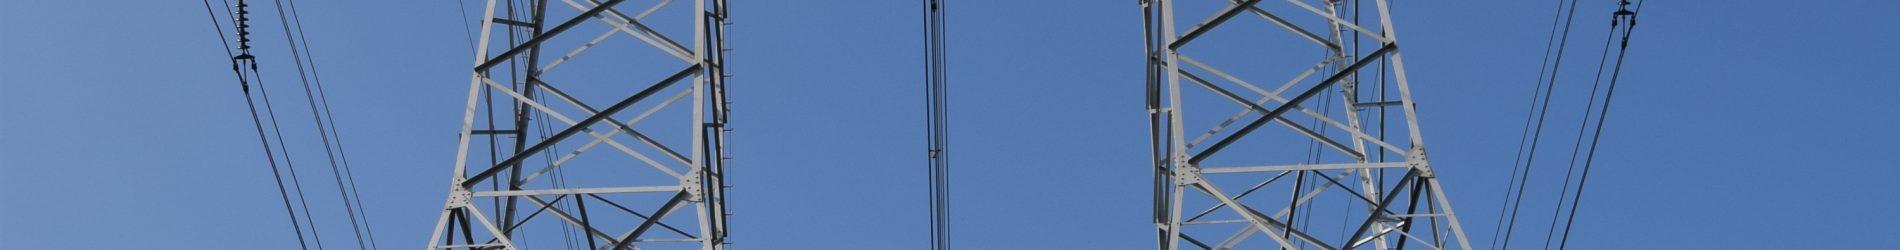 Double_pylon_380_kV_Tilburg_NL_2017